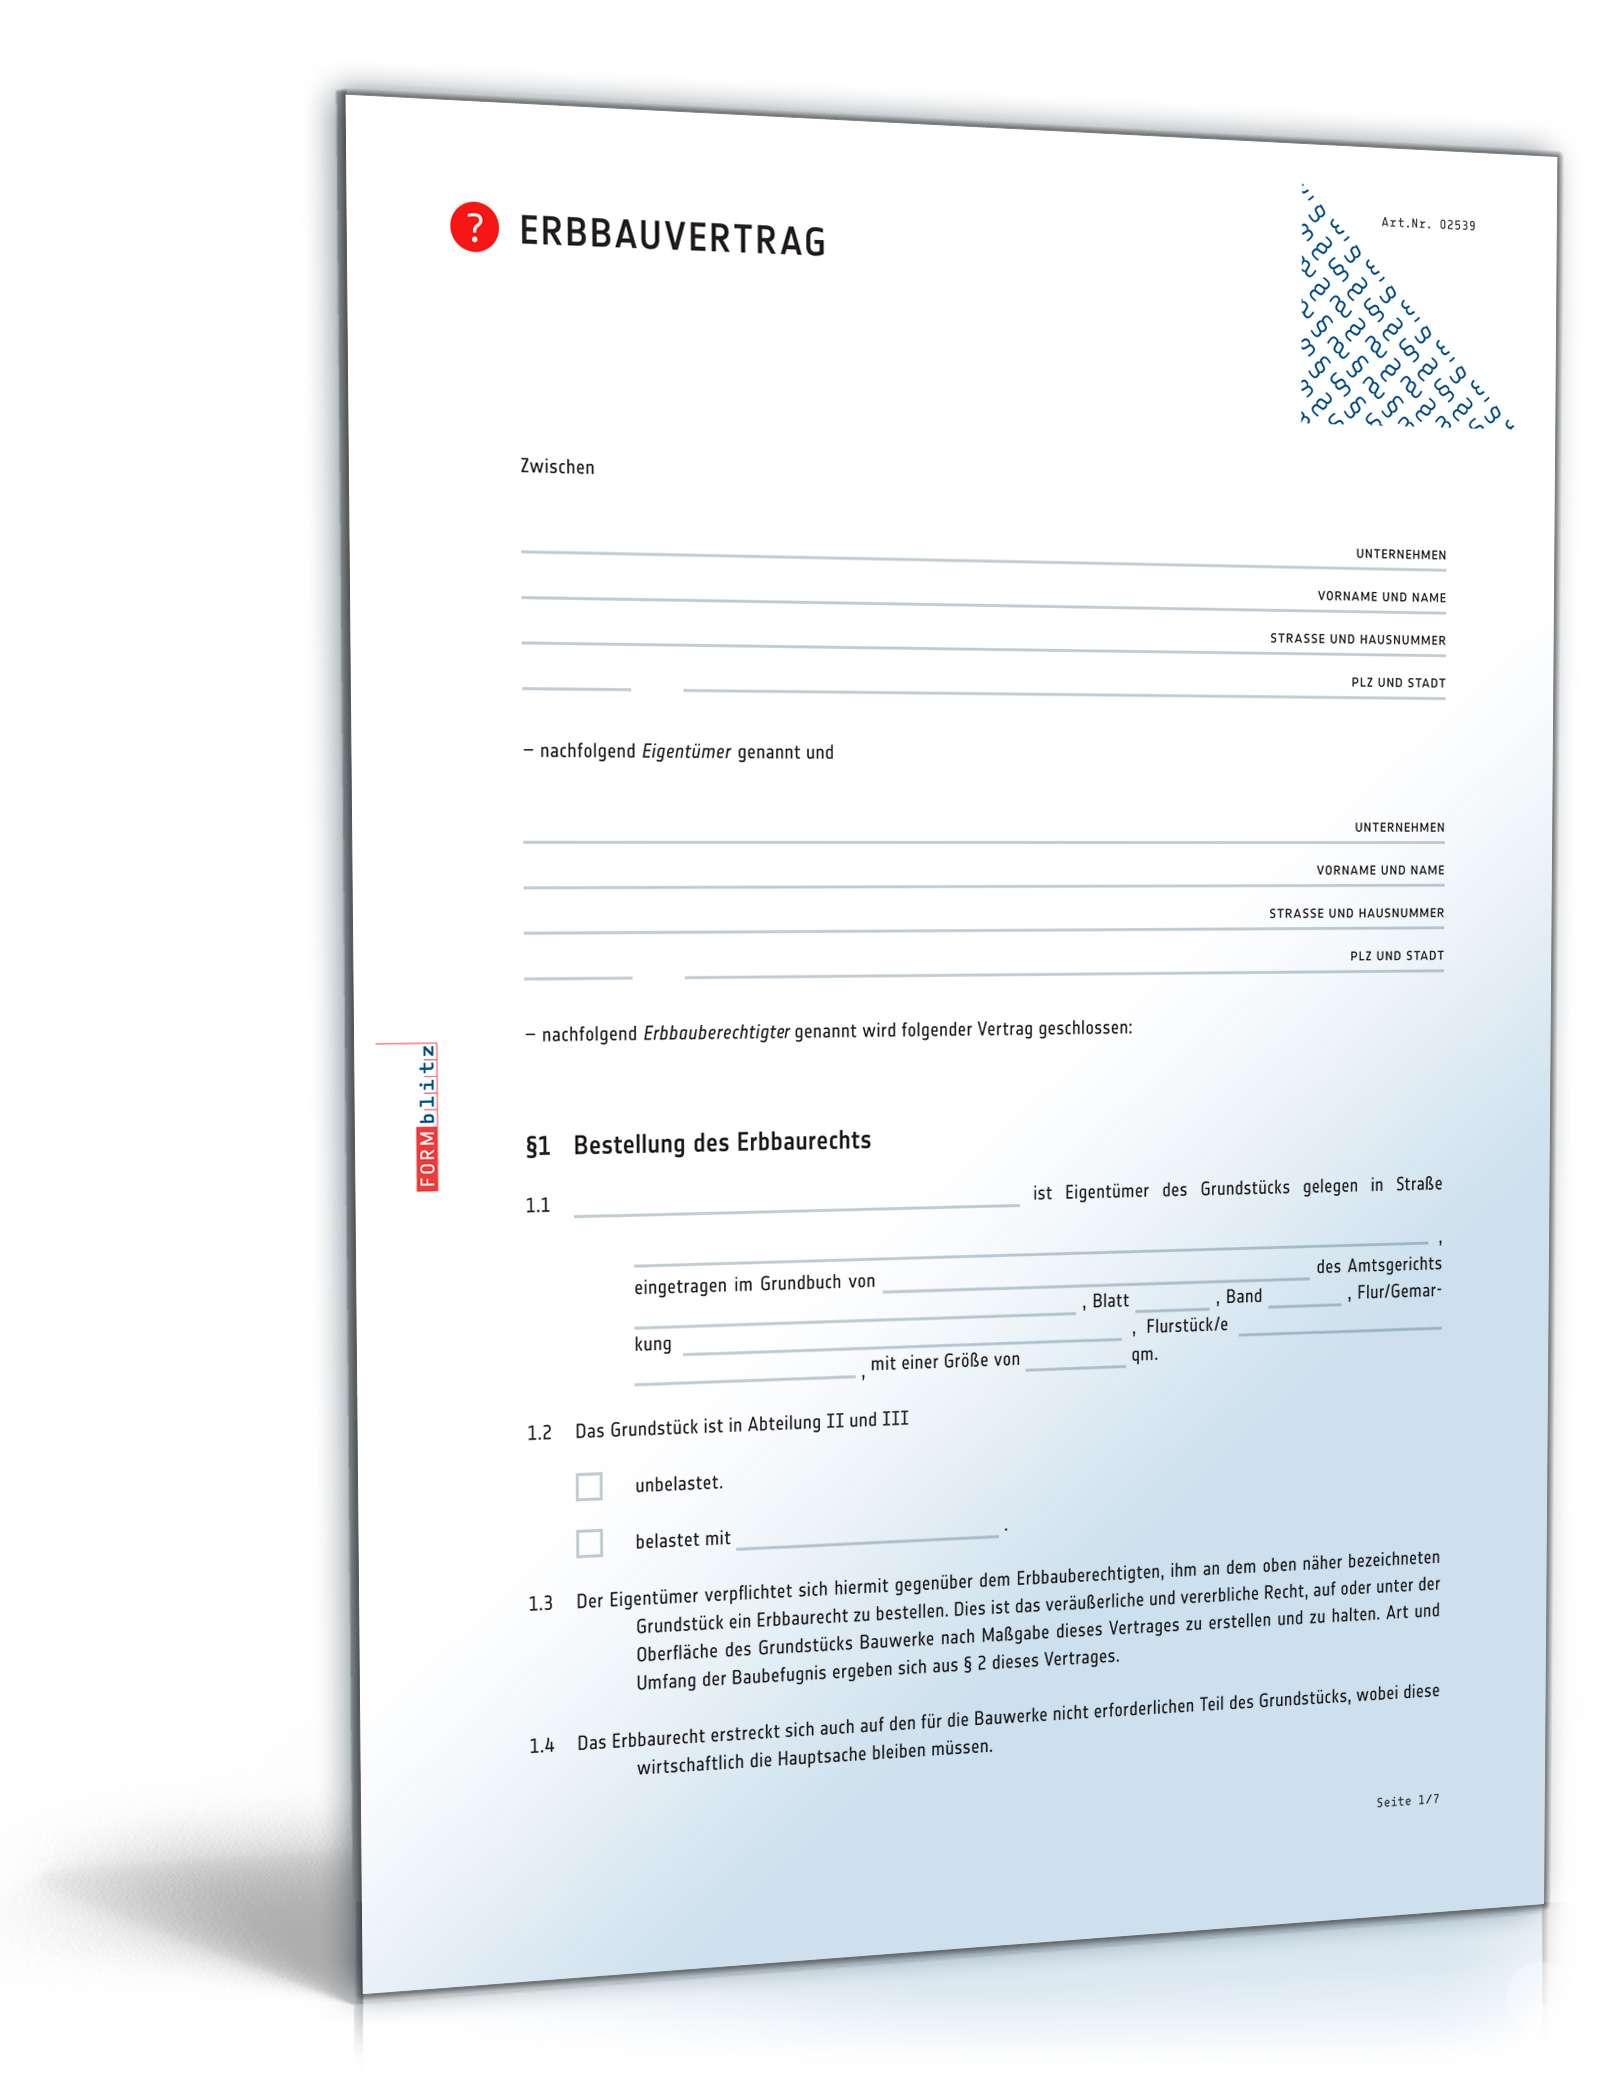 Musterbriefe Notar : Erbbauvertrag anwaltsgeprüftes muster zum download